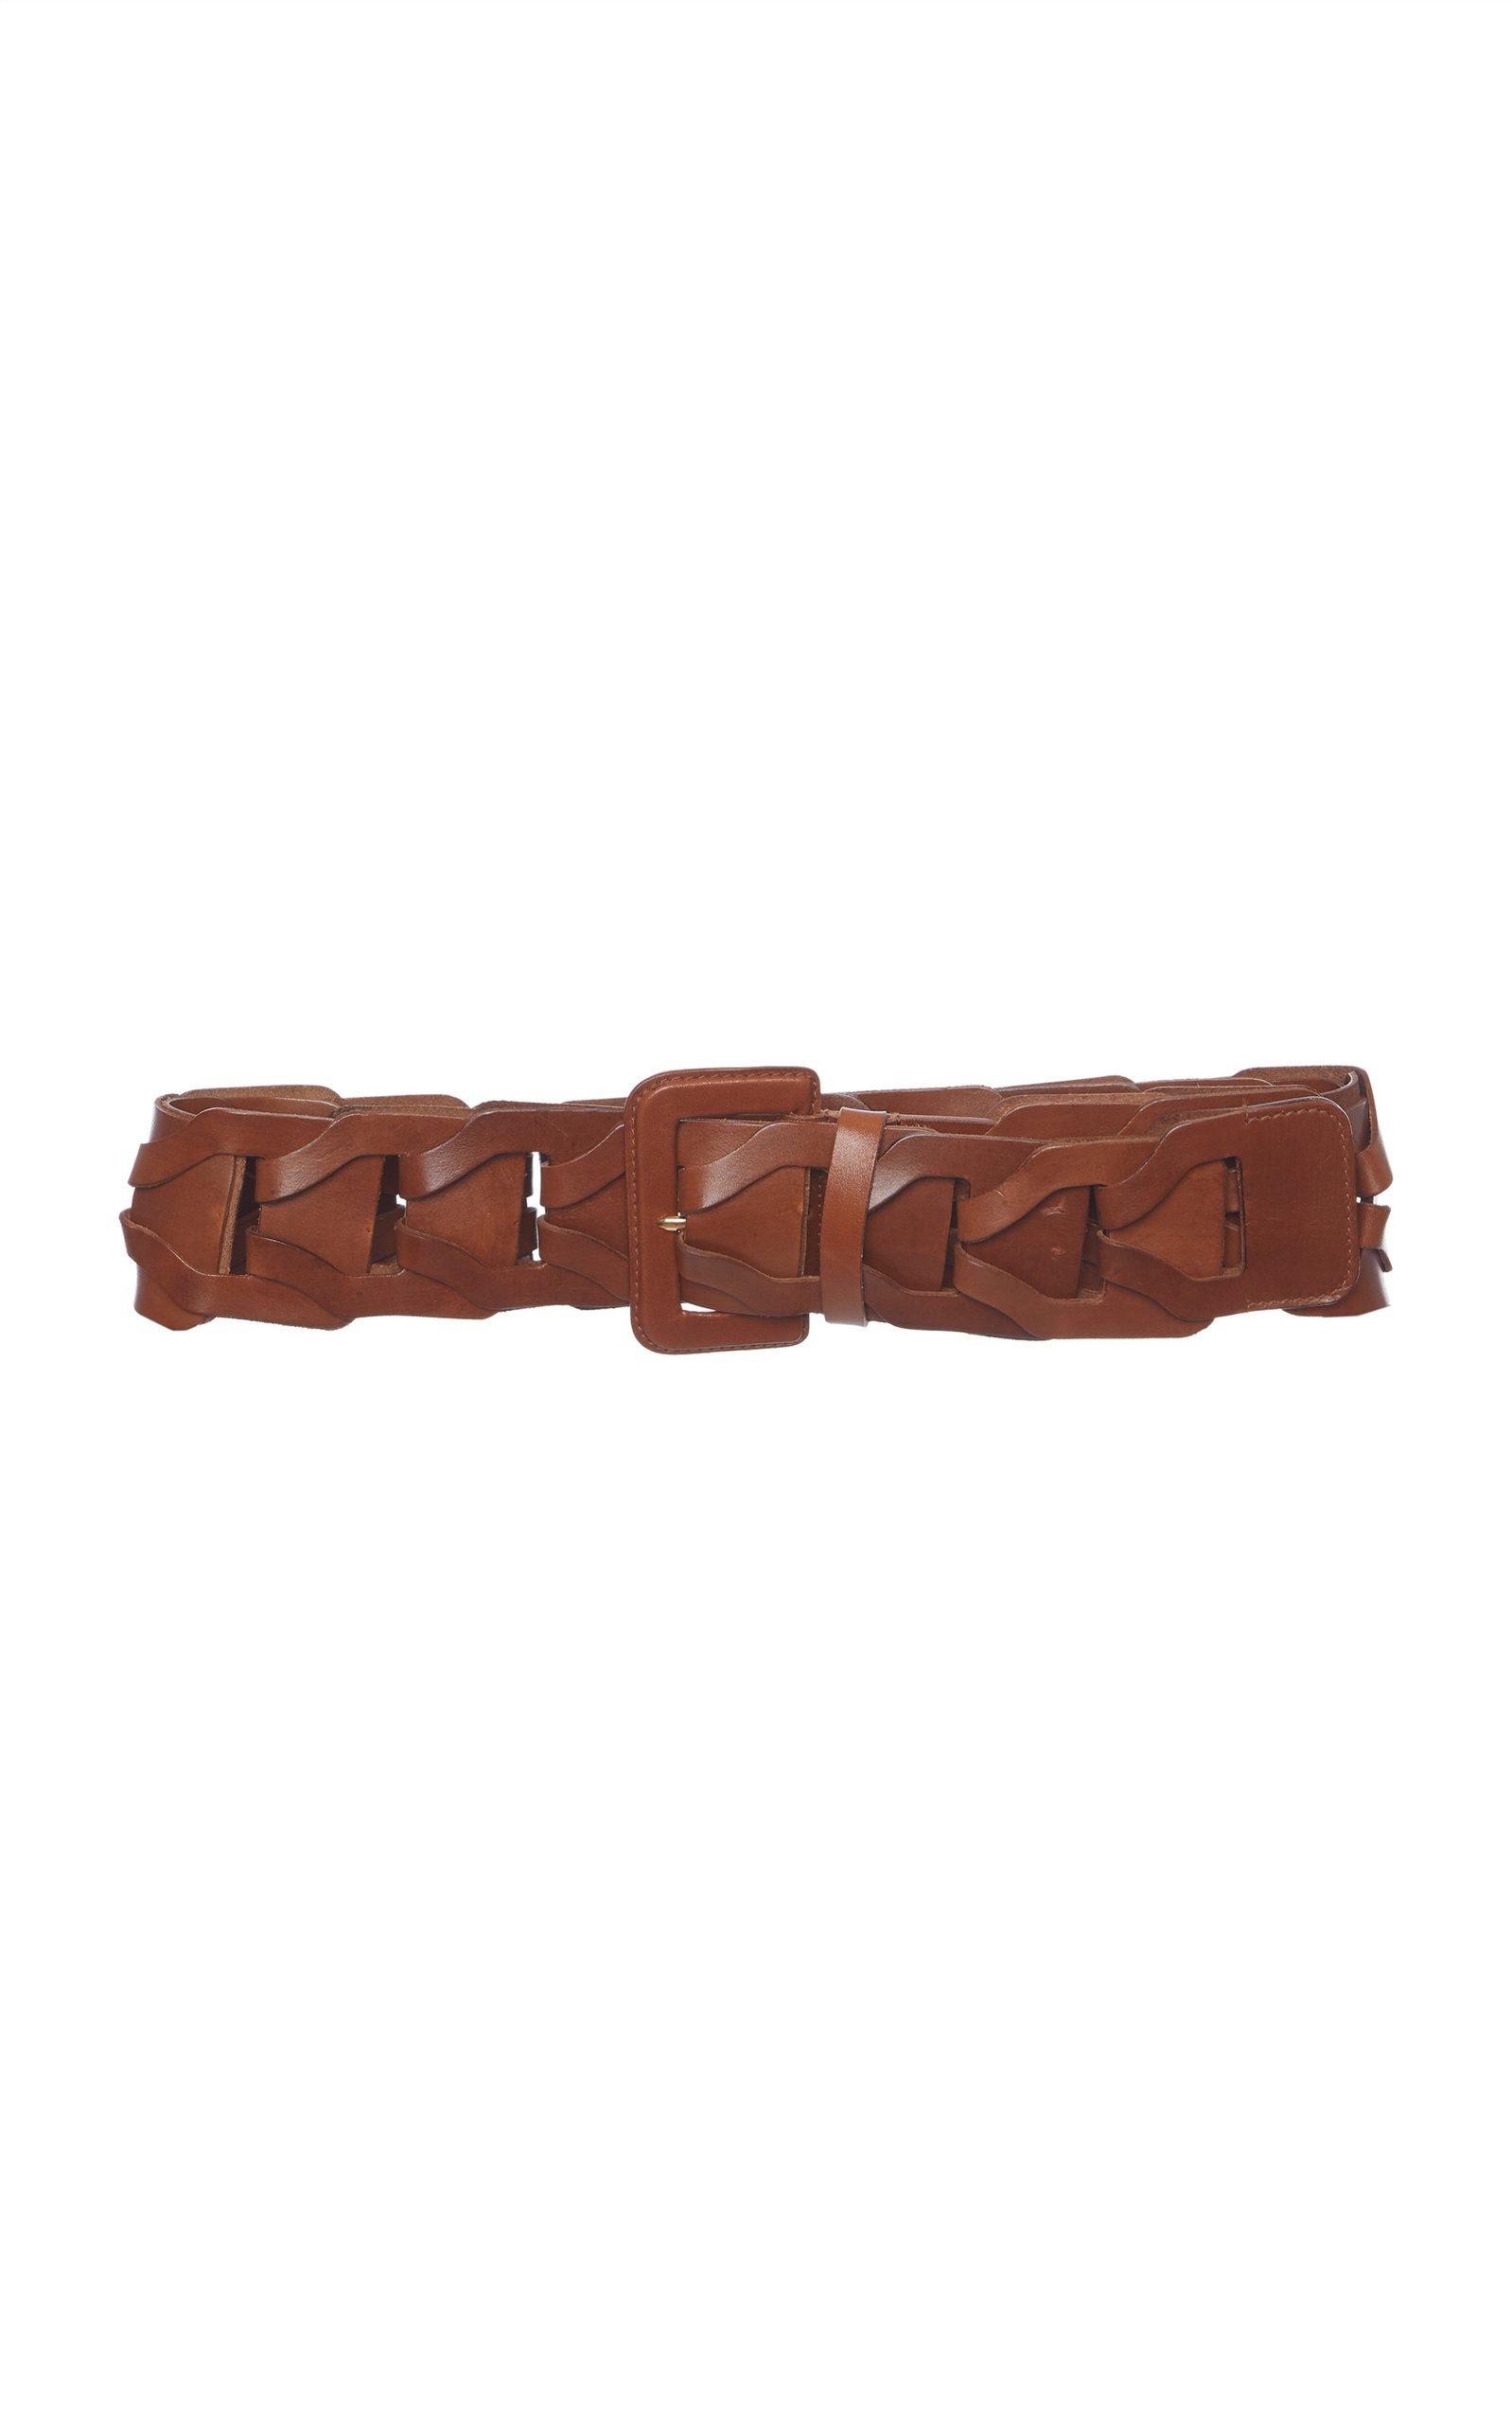 Prada Wide Woven Leather Belt Size: 90 cm